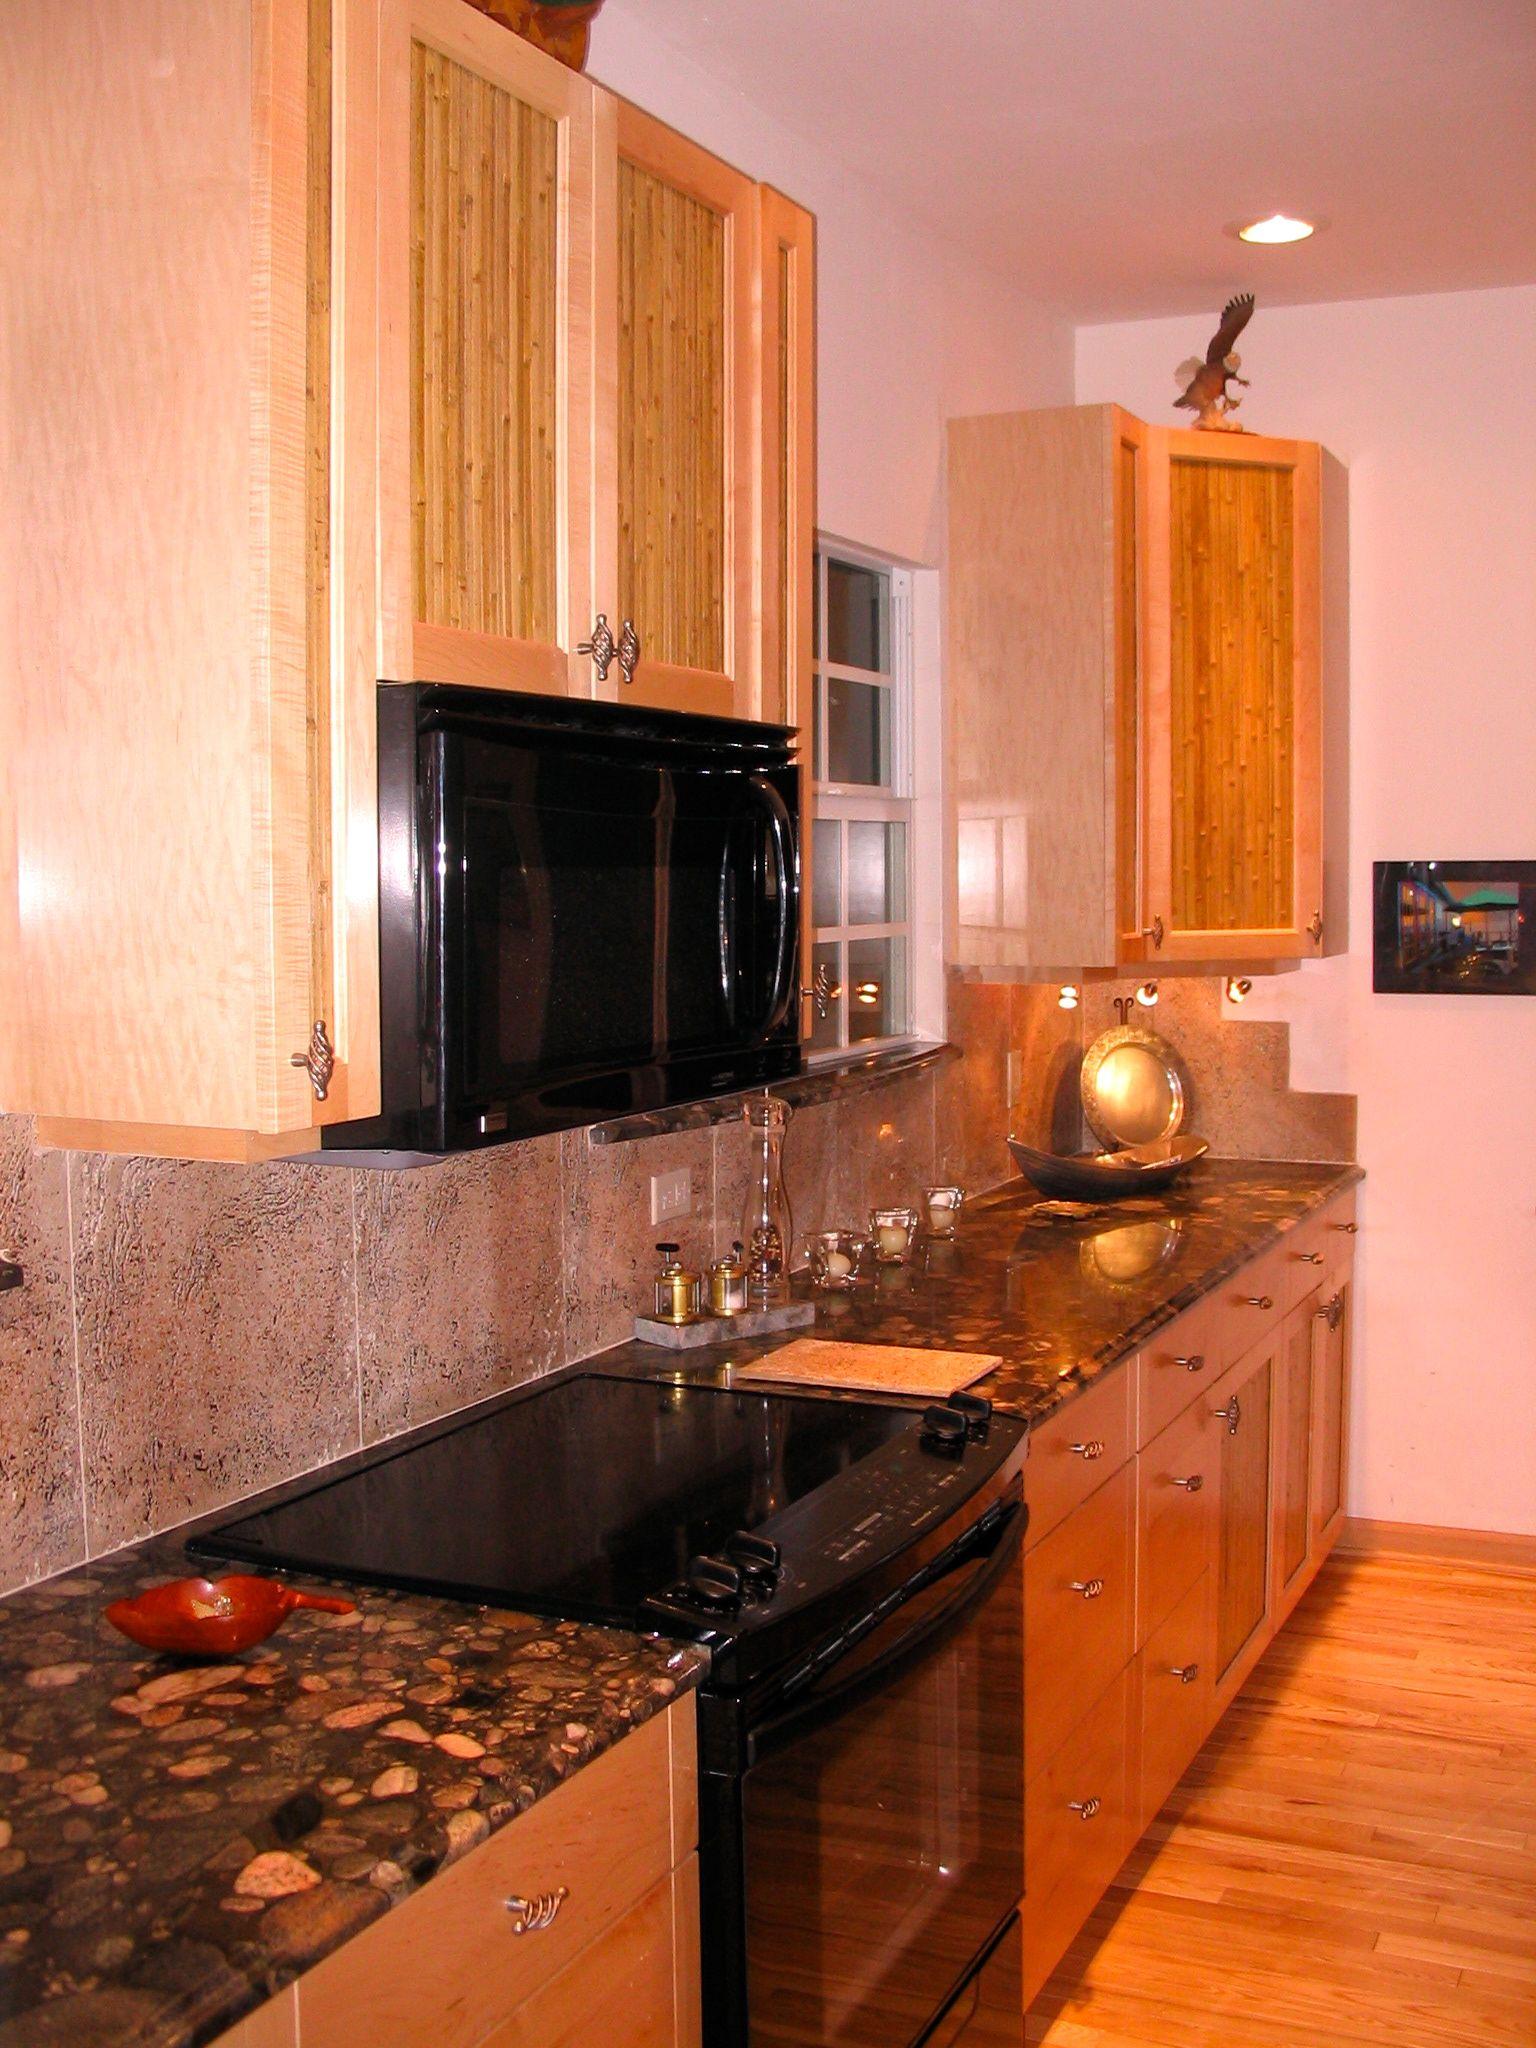 Fort Myers Kitchen Remodeling | Kitchen remodel, Kitchen ...